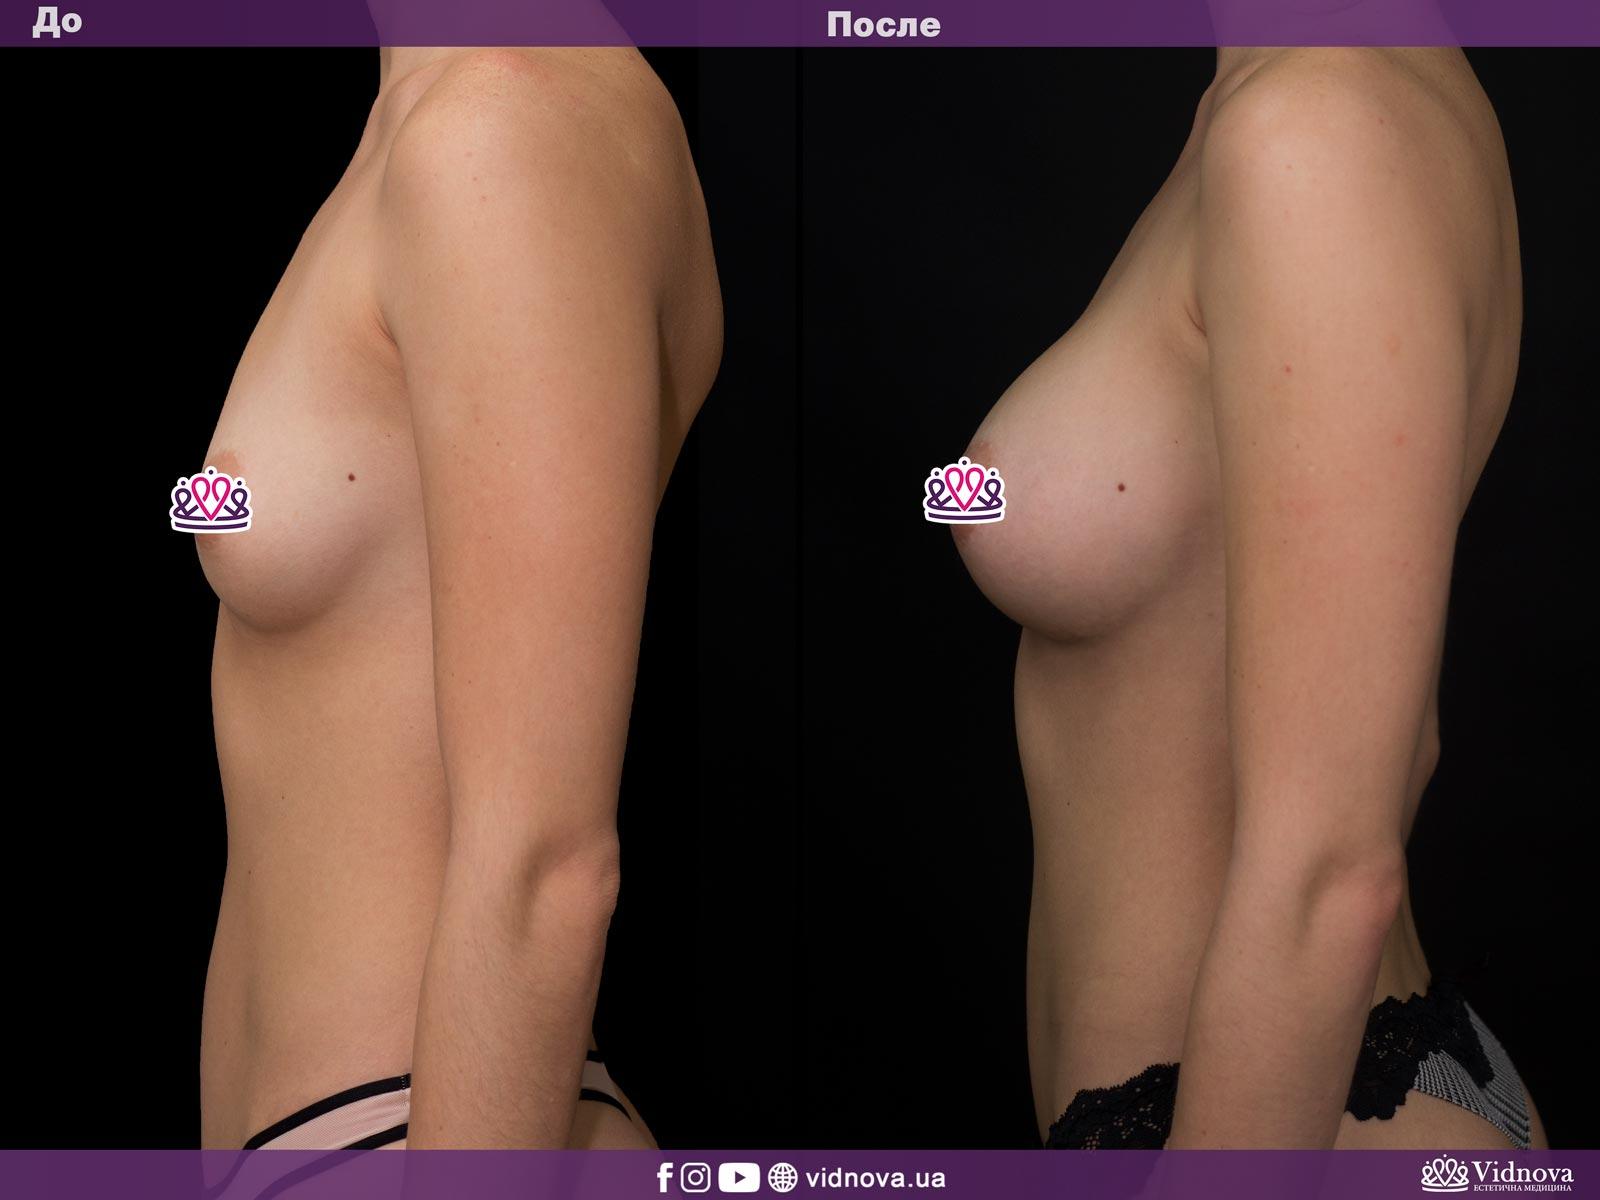 Увеличение груди: Фото ДО и ПОСЛЕ - Пример №9-3 - Клиника Vidnova